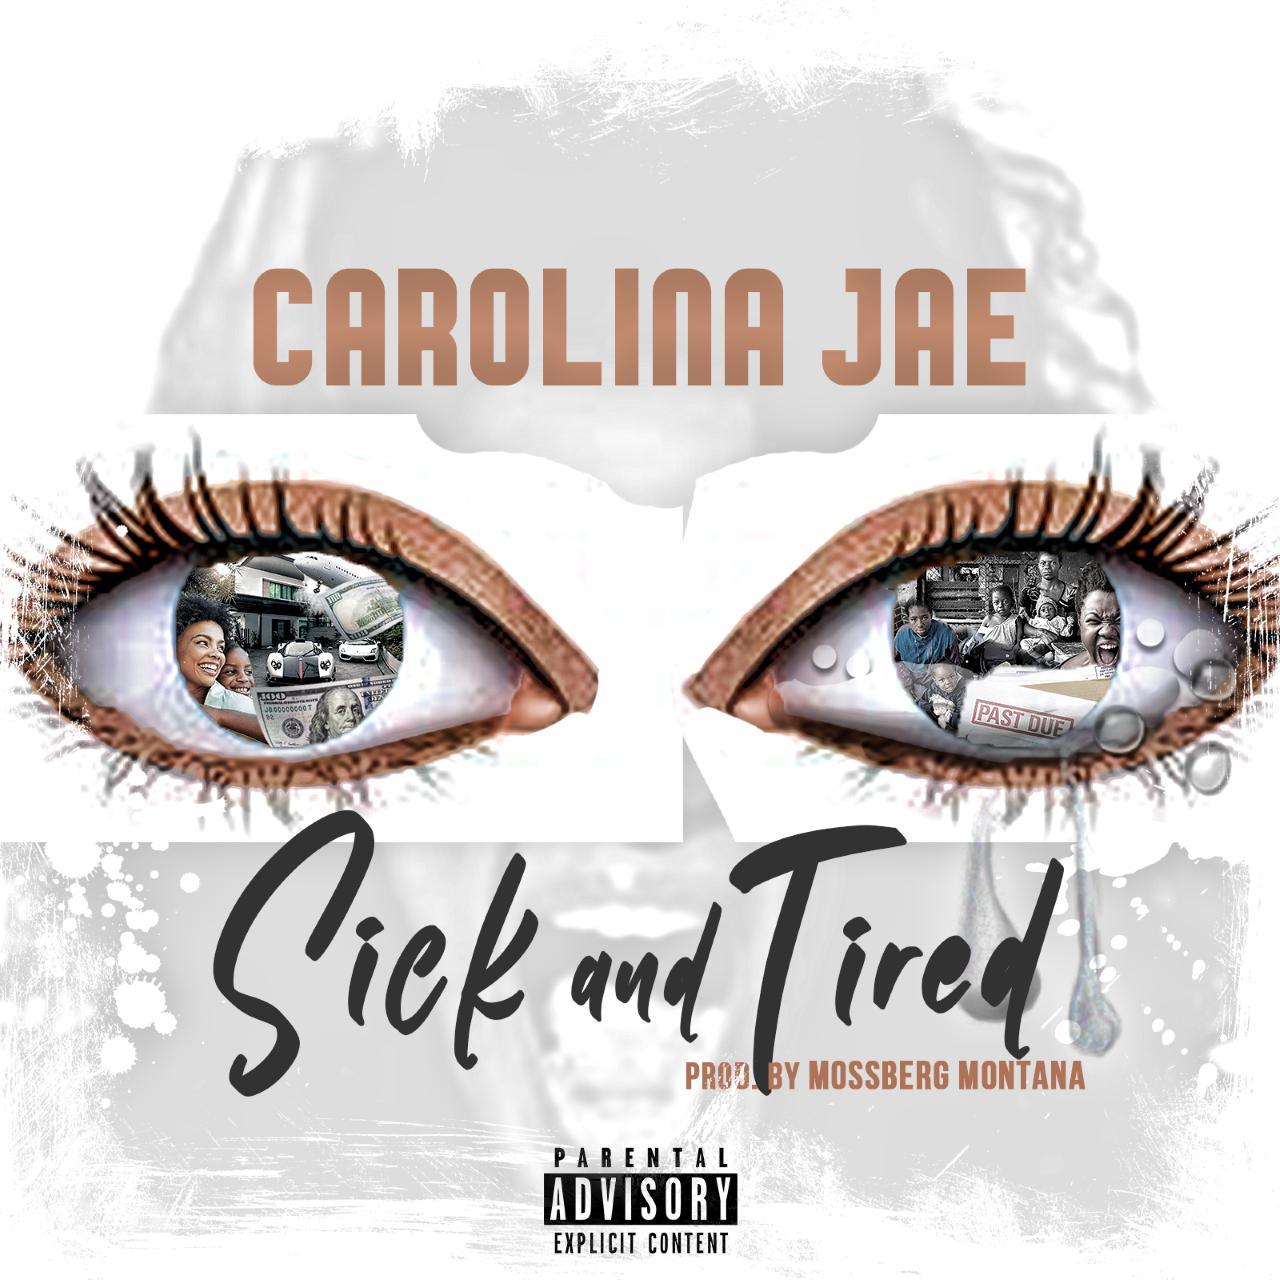 Sick Tired by Carolina jae